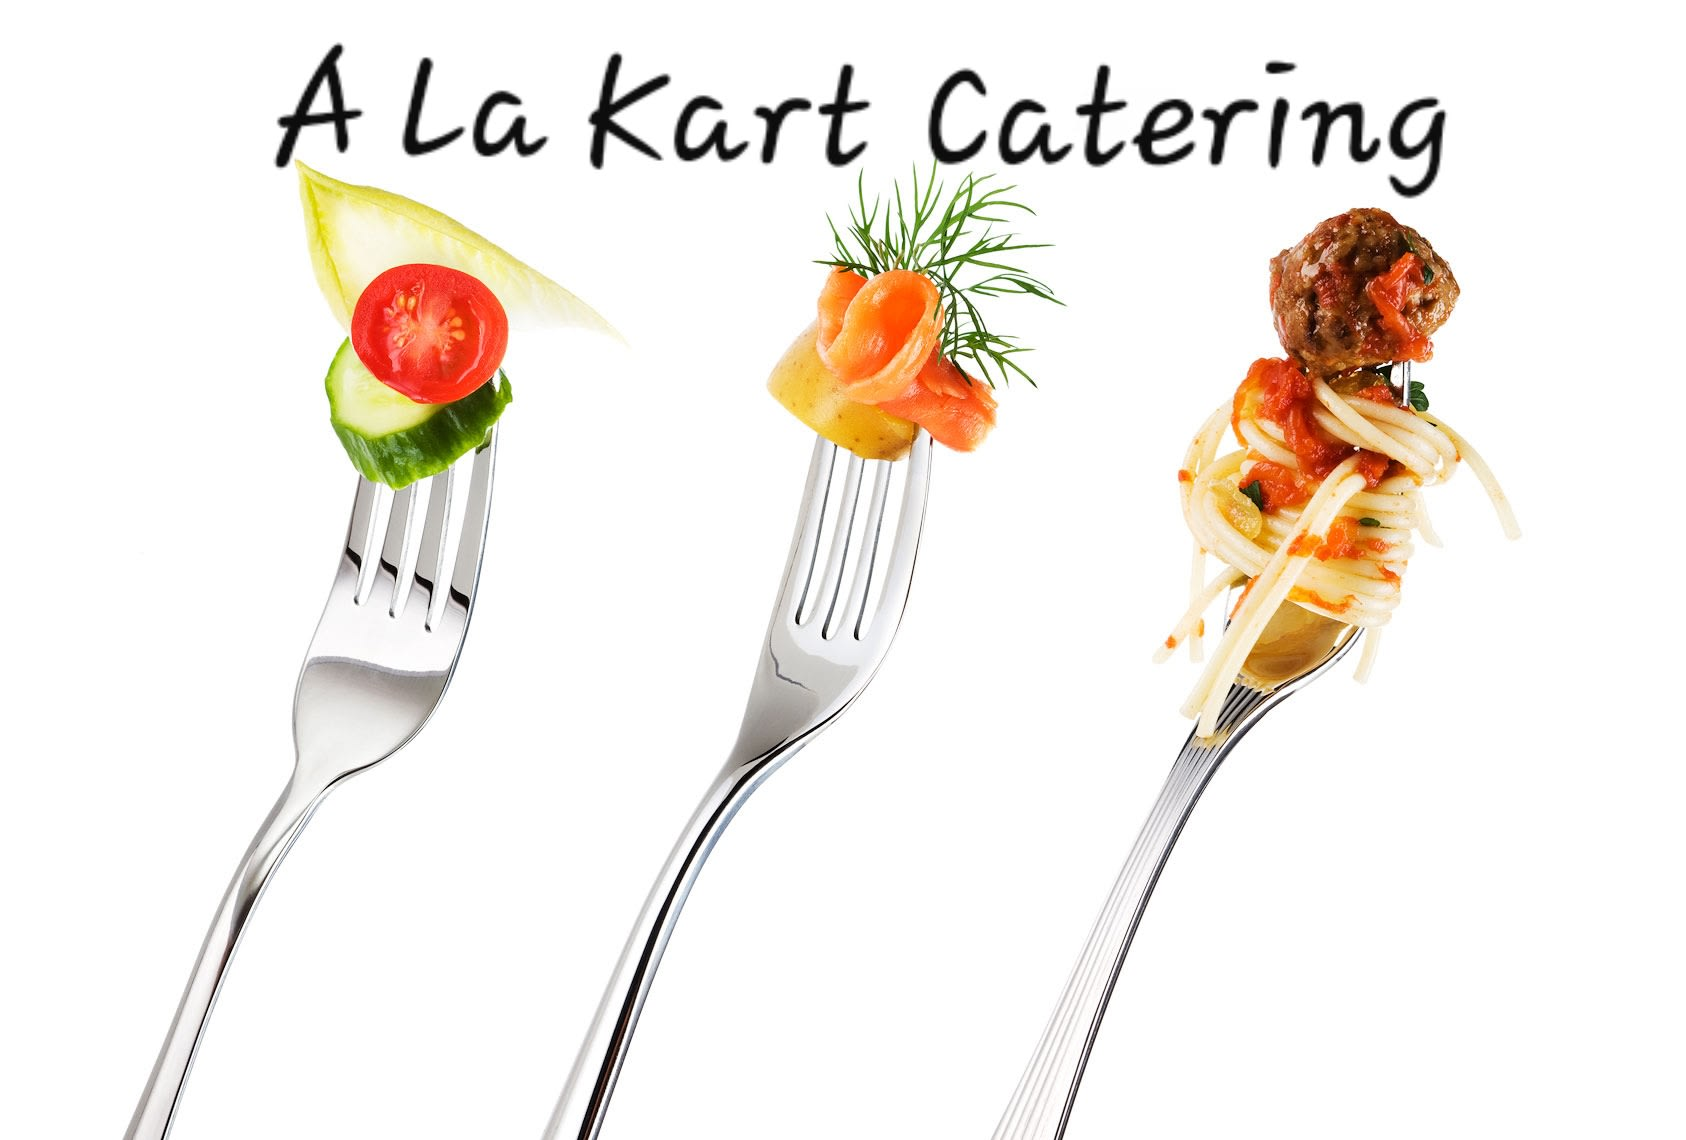 A La Kart Catering